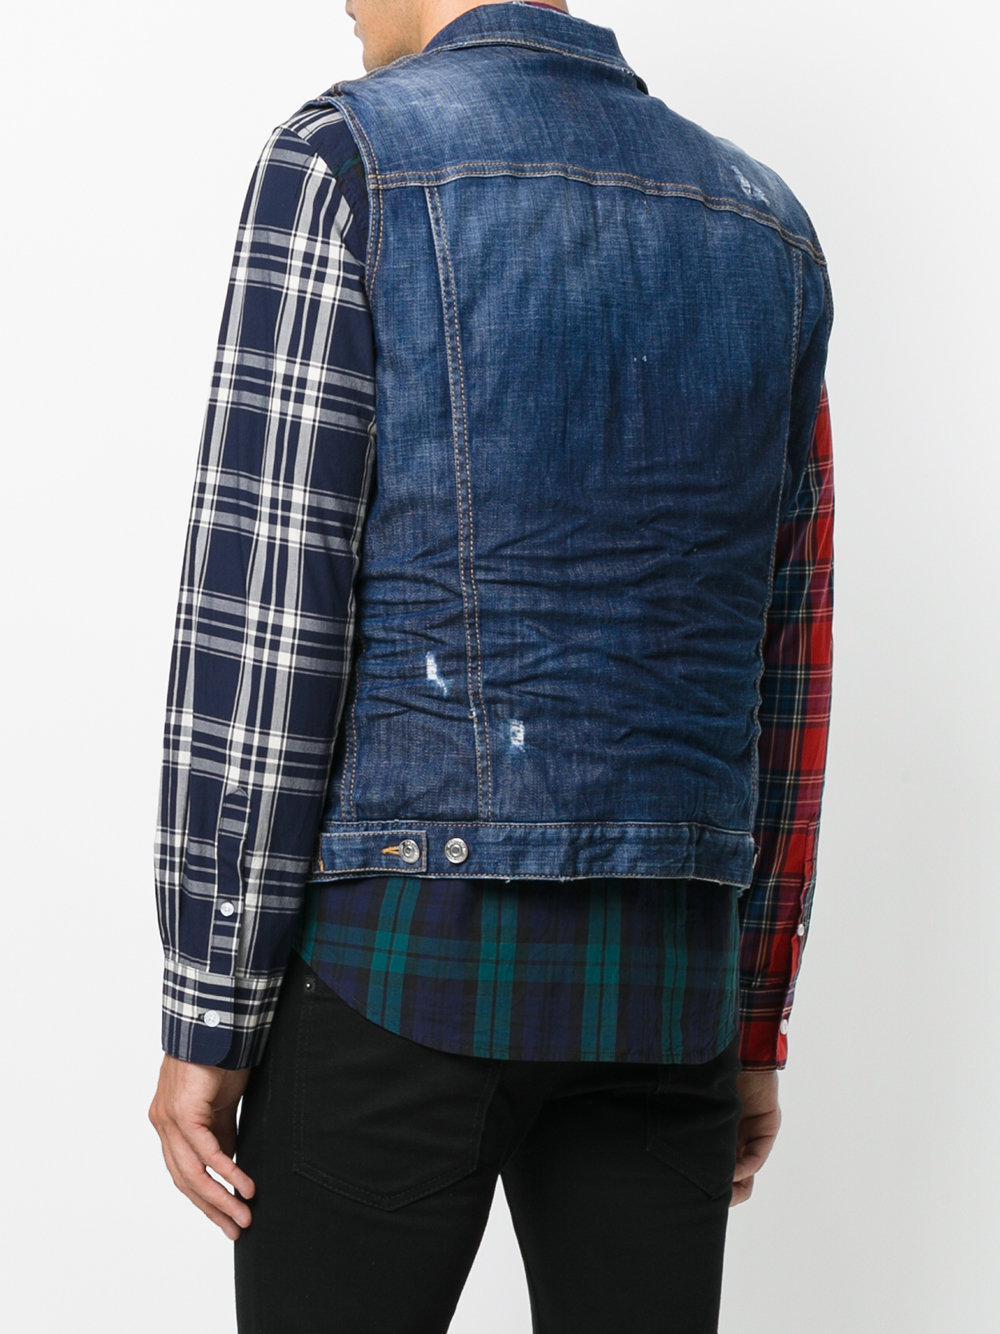 16cc0ae386e17b DSquared² - Blue Distressed Sleeveless Denim Jacket for Men - Lyst. View  fullscreen